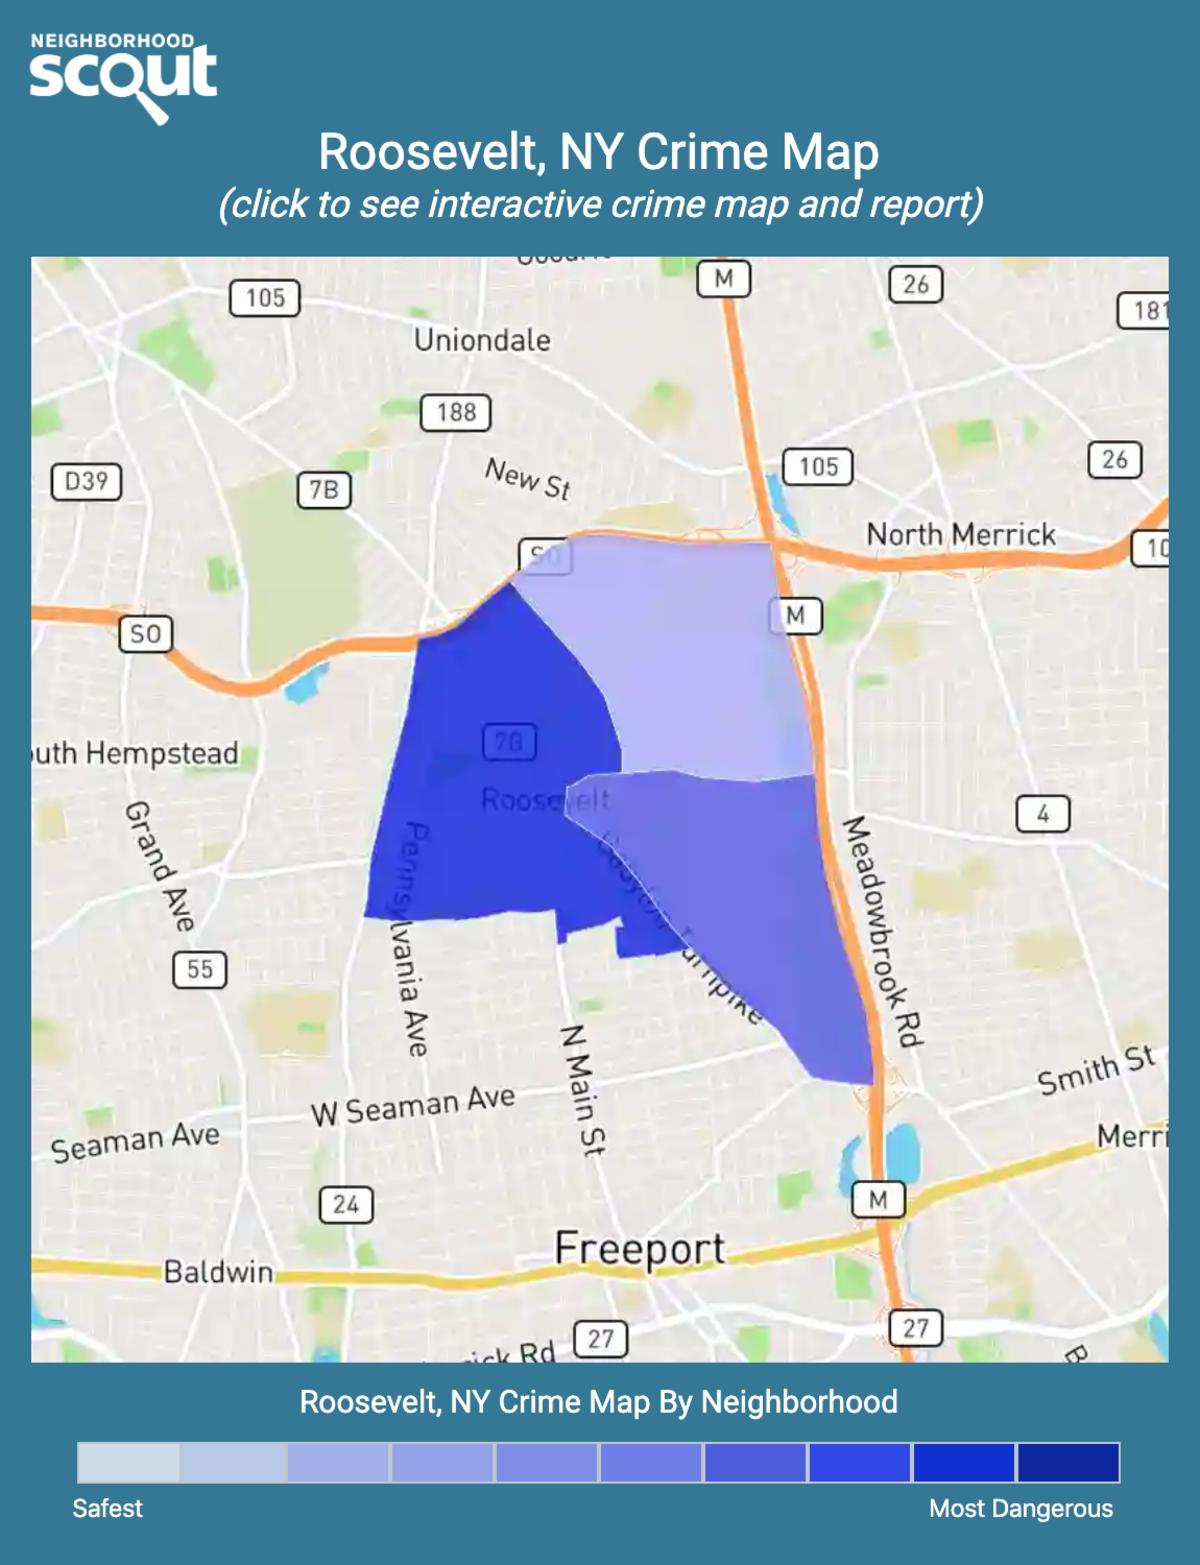 Roosevelt, New York crime map